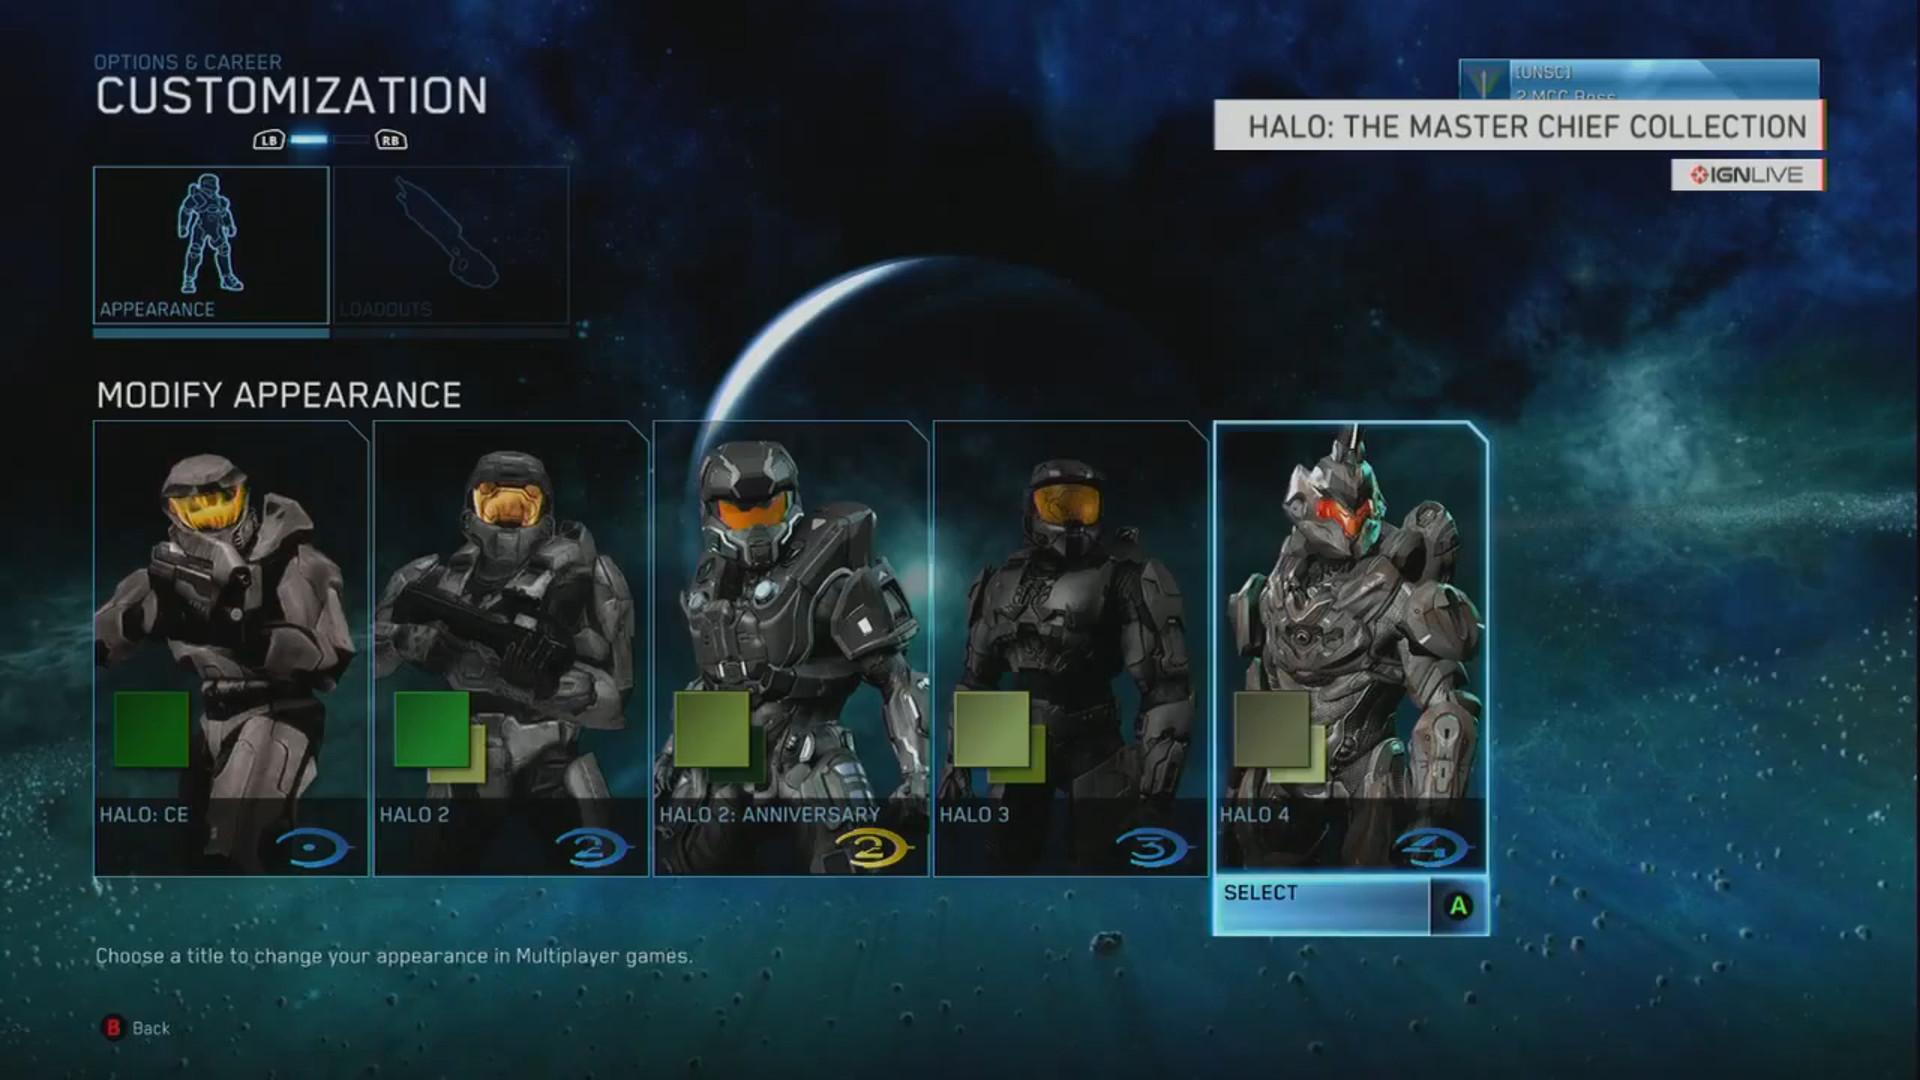 Halo Combat Evolved Wallpaper (77+ images)